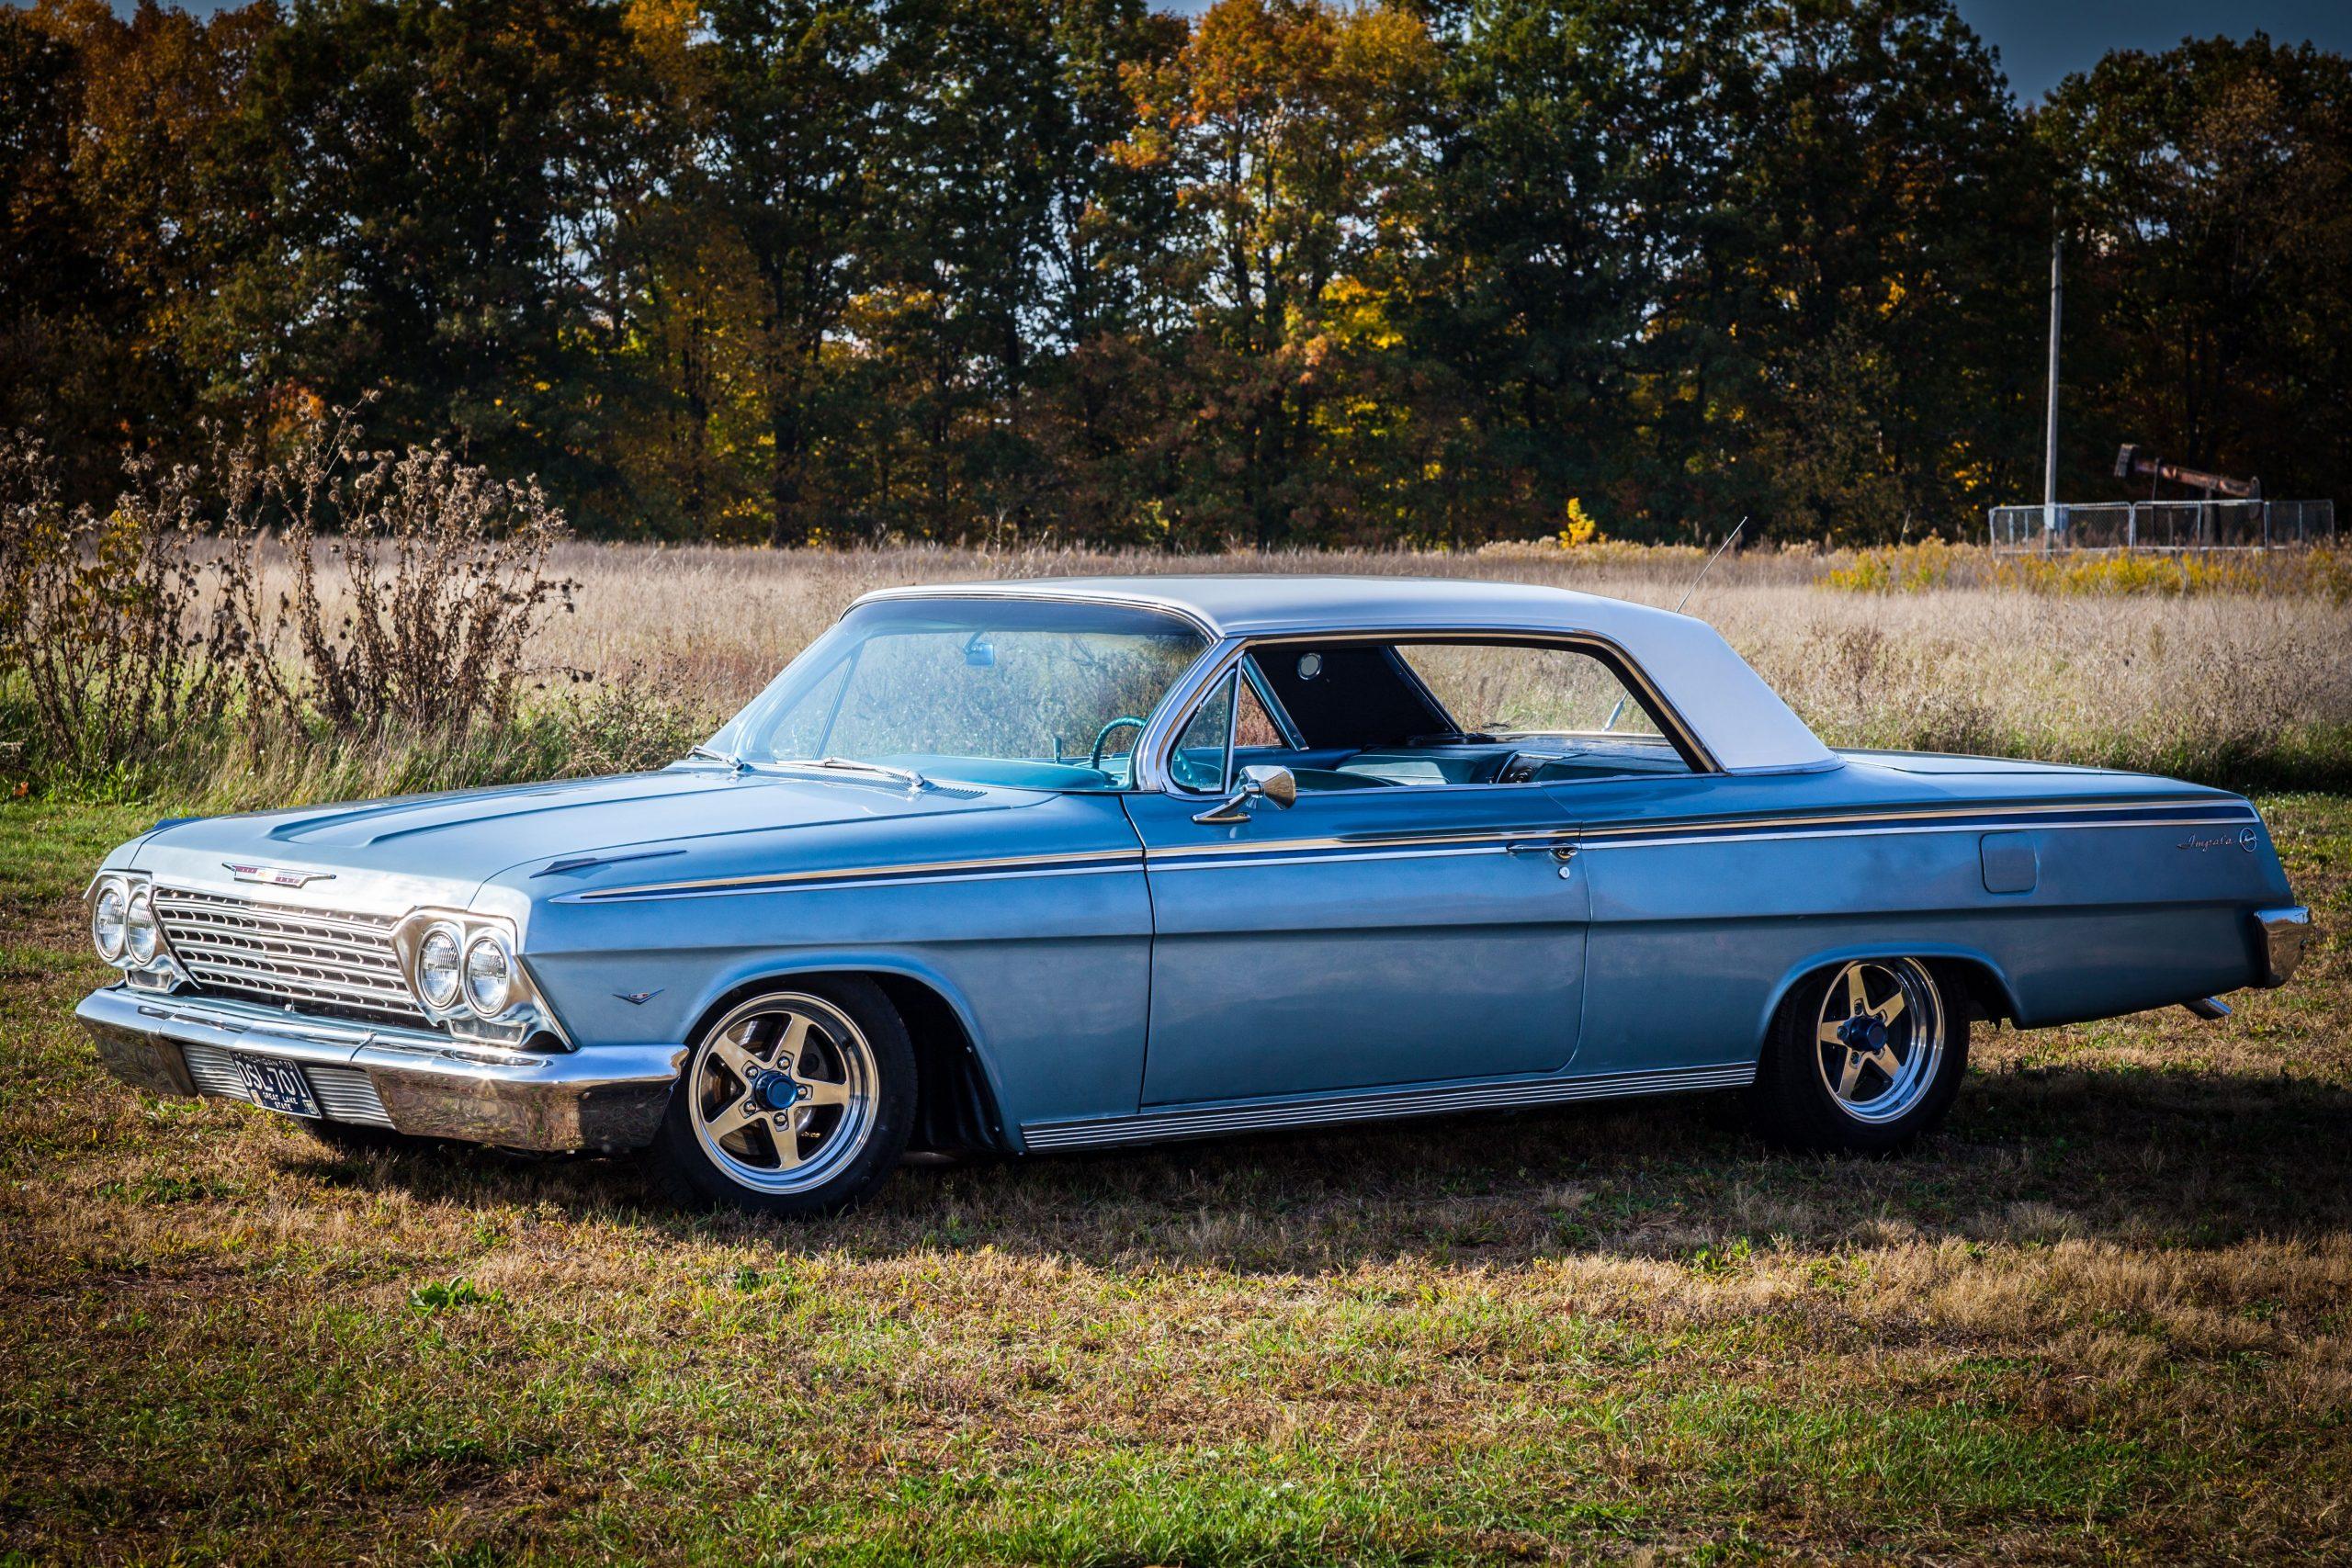 Jason Prince - 1962 Chevrolet Impala - full drivers side